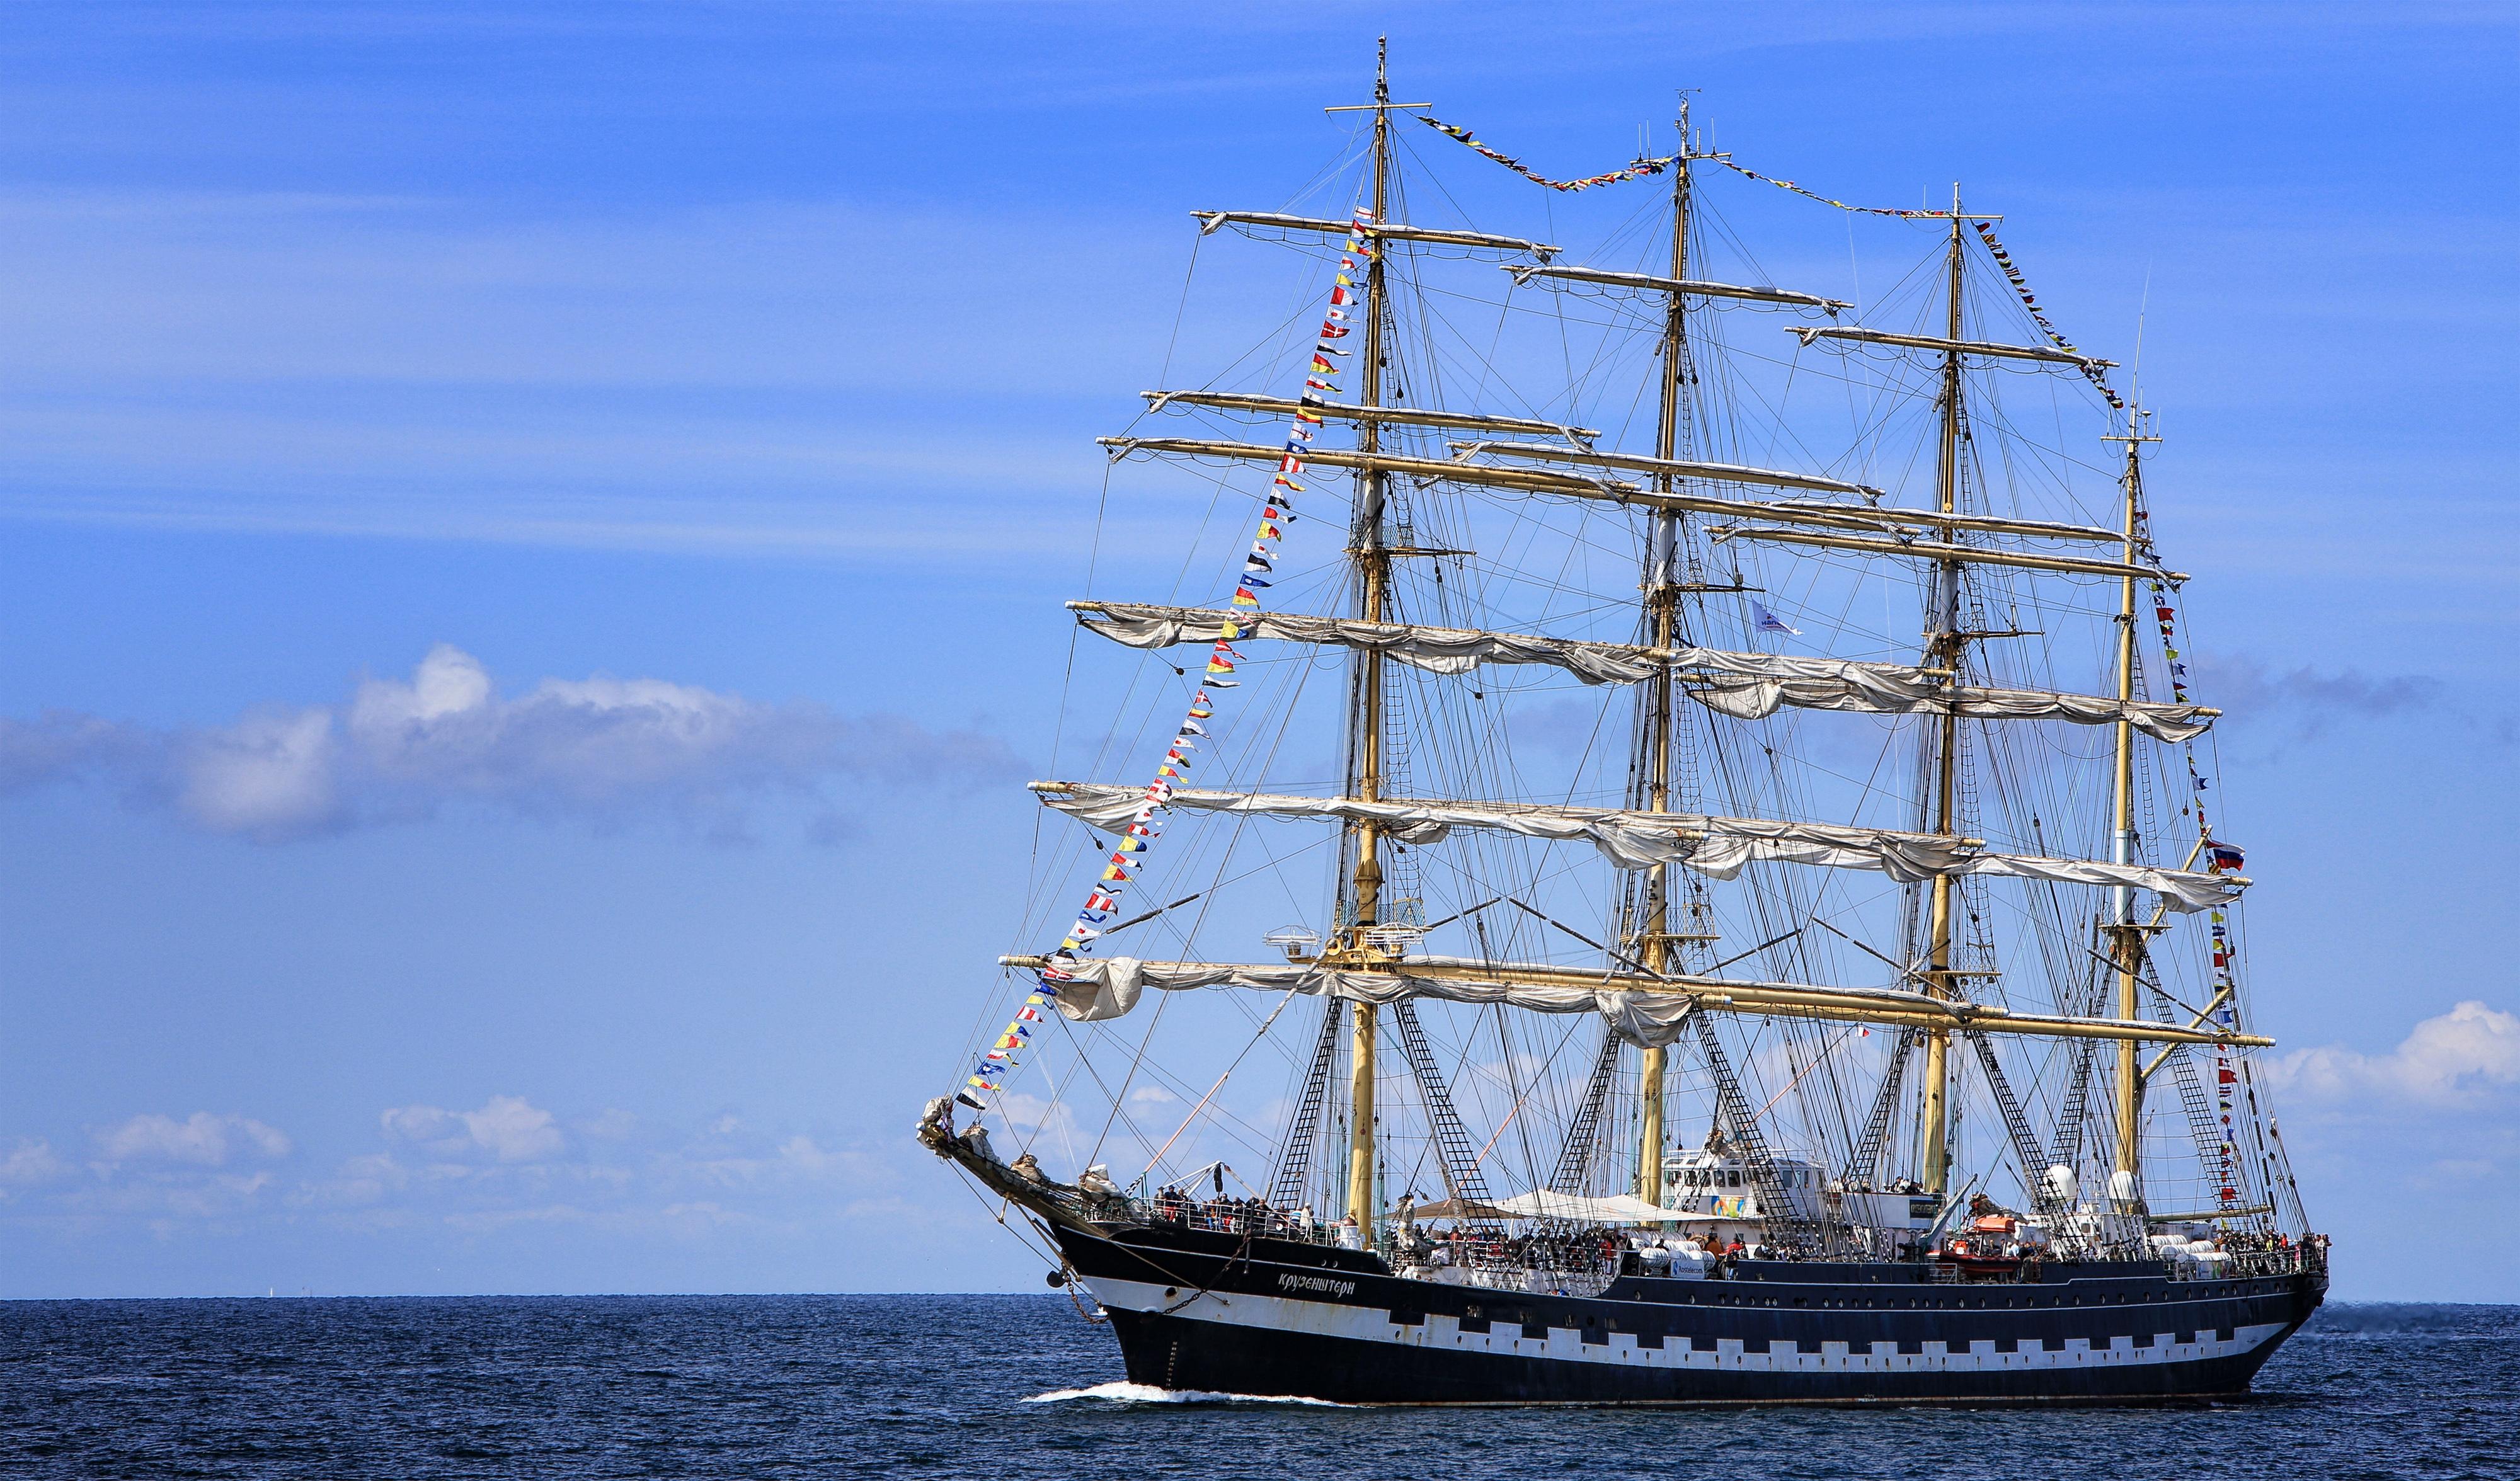 обои море, парусник, барк, Крузенштерн картинки фото